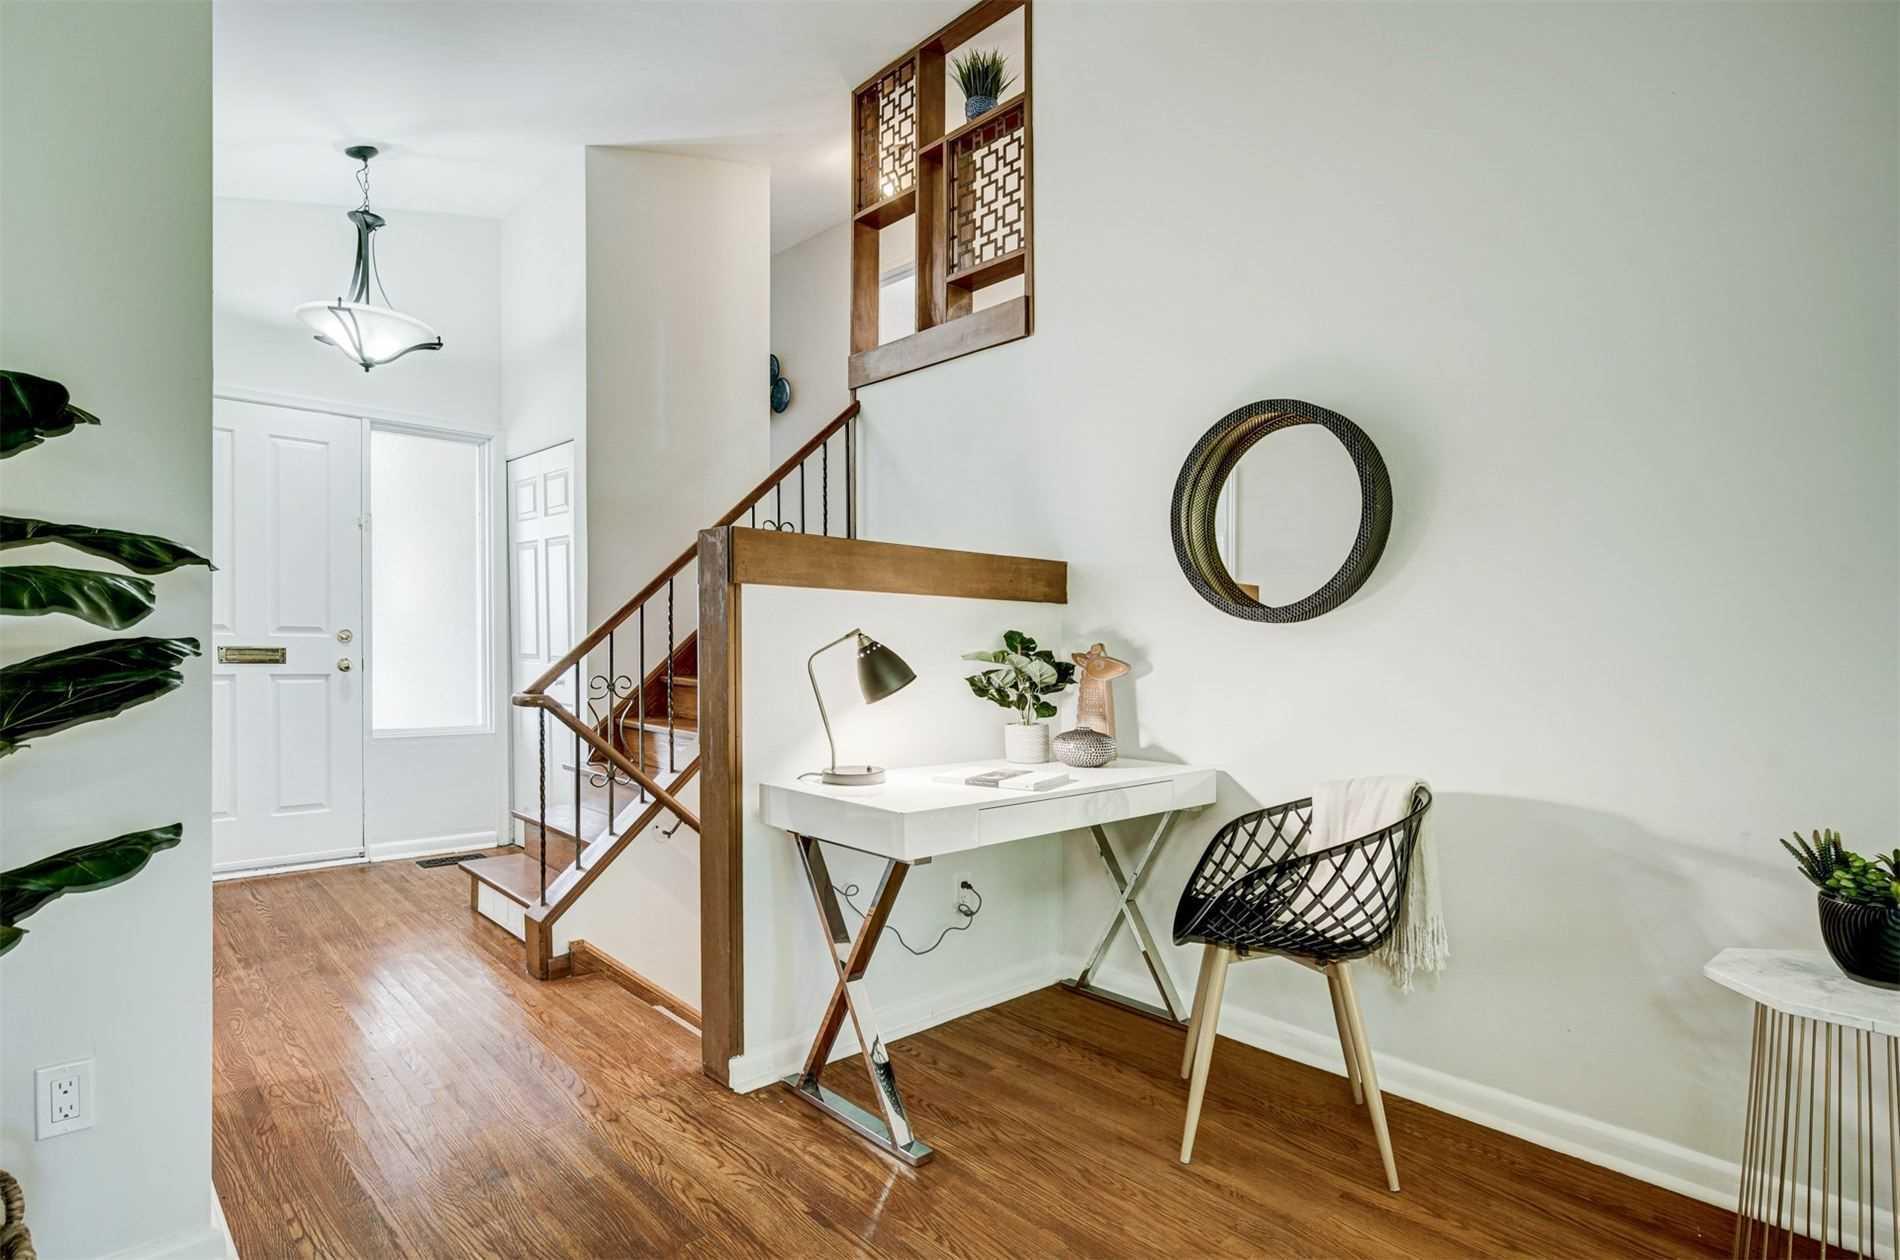 140 Verobeach Blvd - Humbermede Detached for sale, 3 Bedrooms (W5385046) - #5